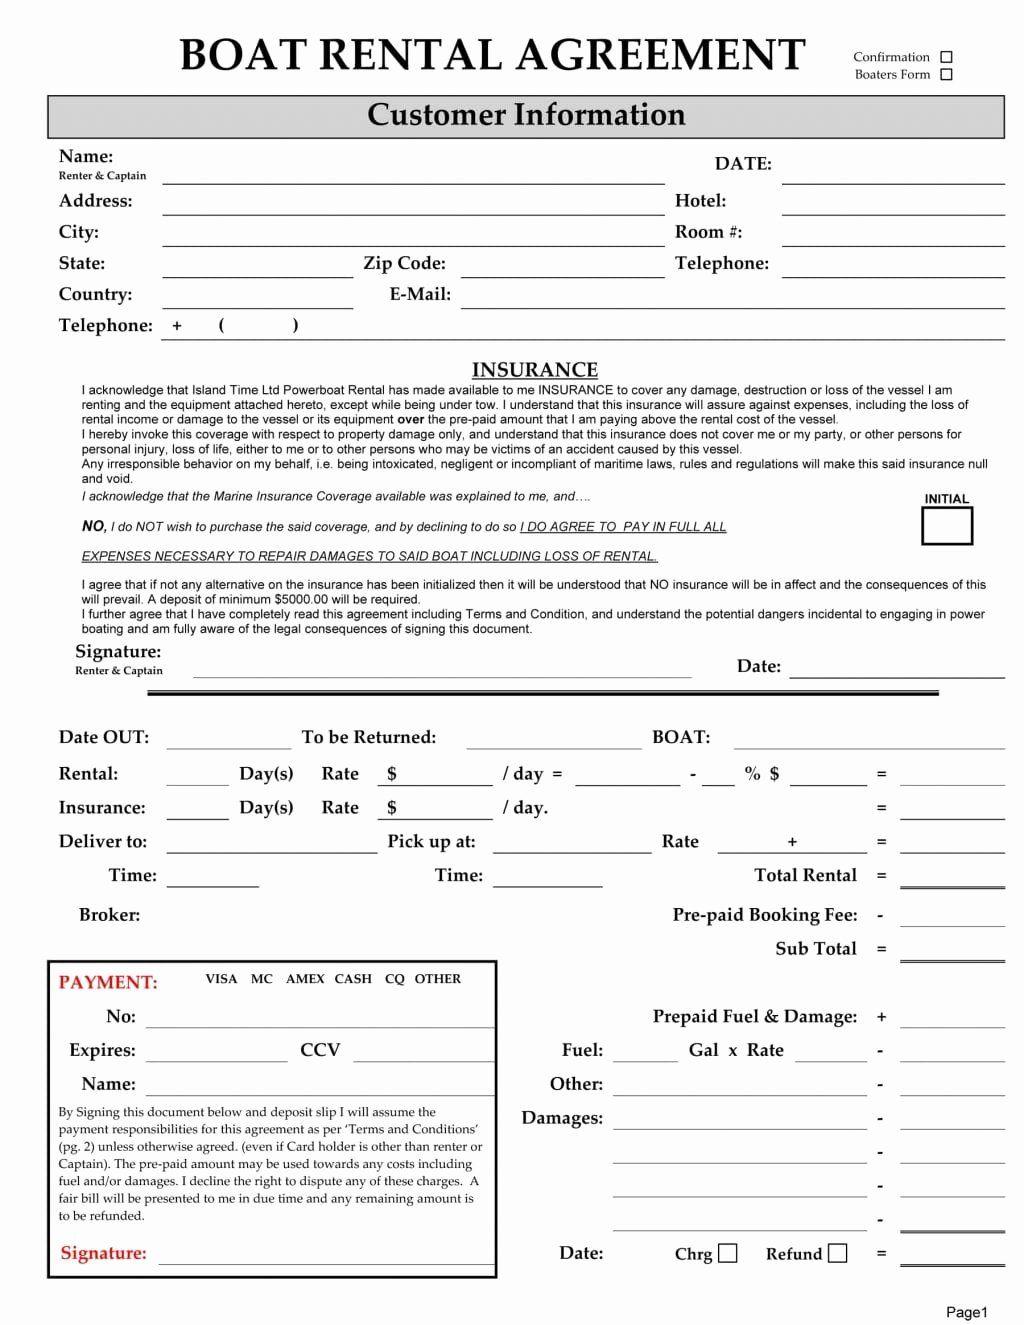 Rental Contract Template Free Elegant 6 Free Rental Agreement Templates Excel Pdf Formats Rental Agreement Templates Contract Template Lease Agreement Microsoft word rental agreement template